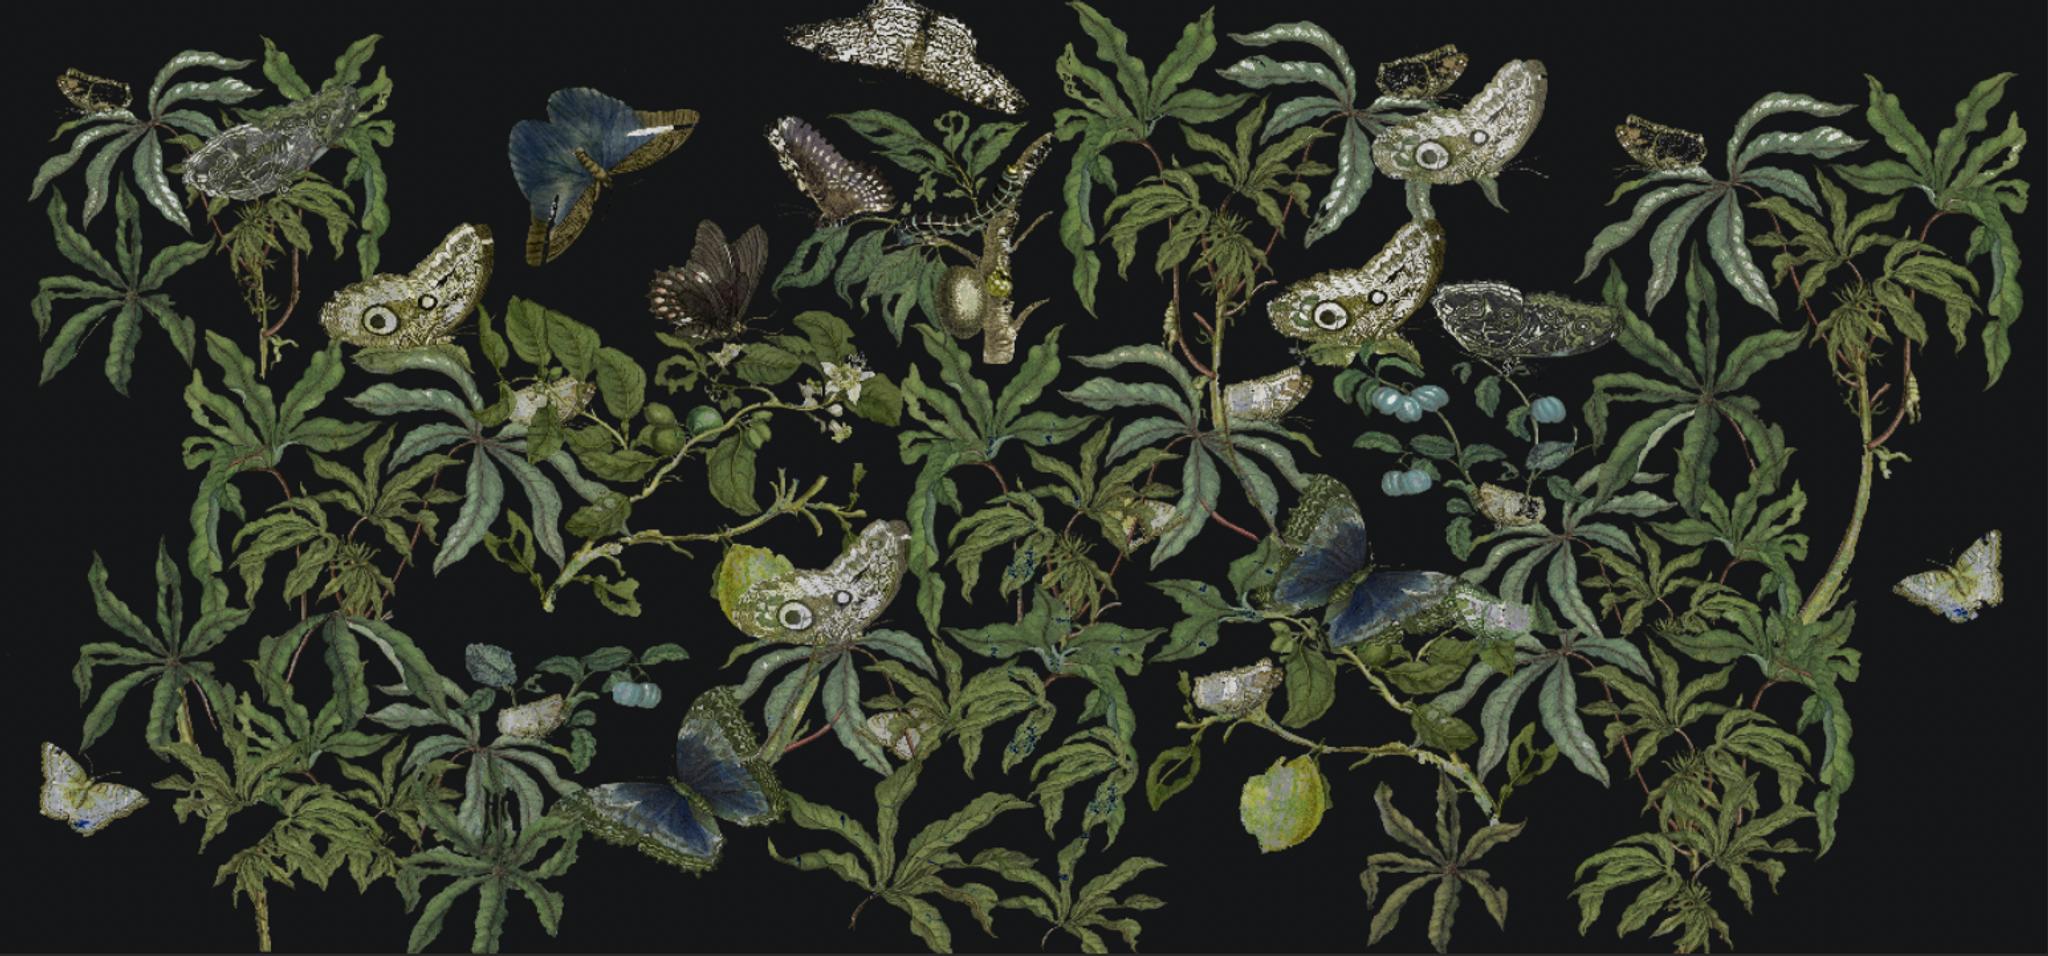 Wallpaper - Plein Air Dining at Night